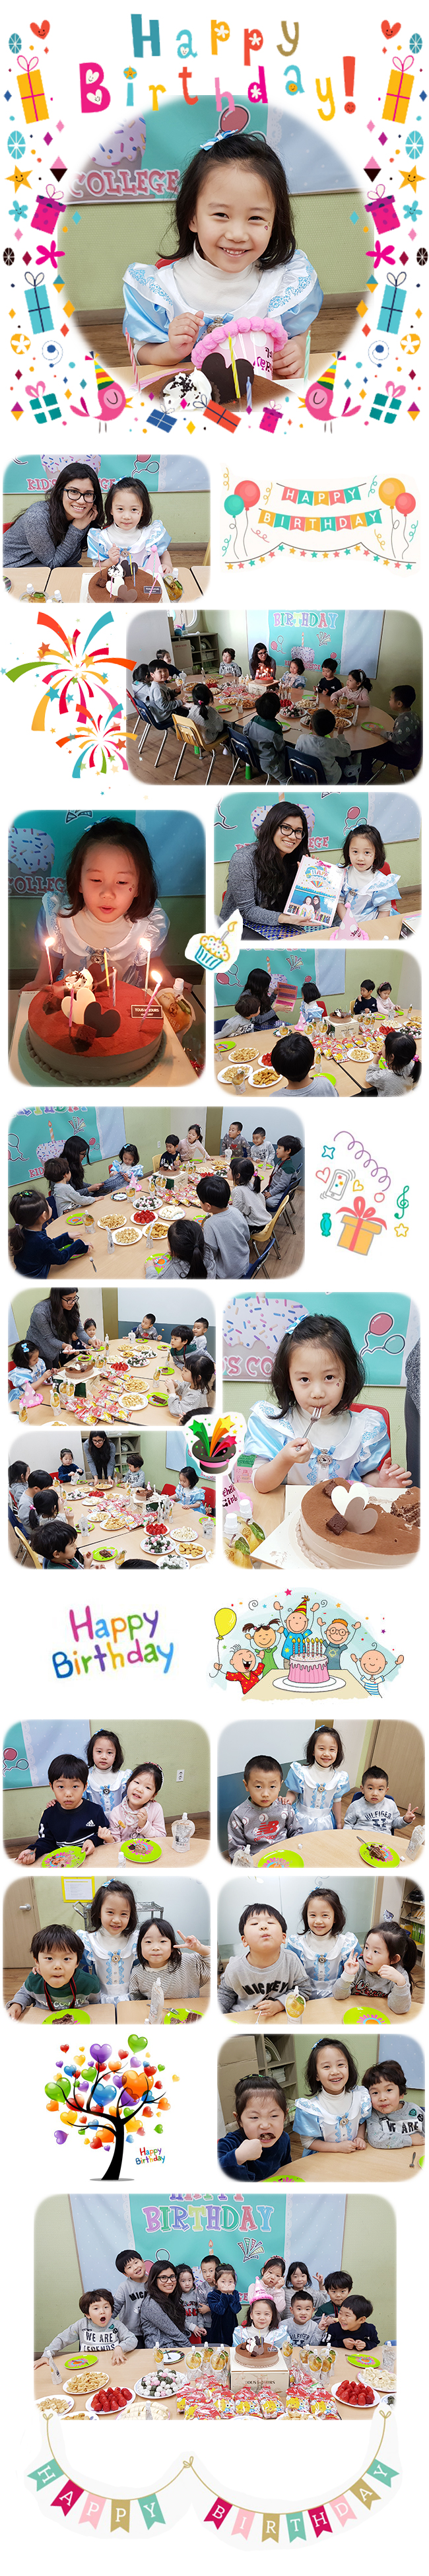 birthday form_2017_홈페이지용 (Jinnie).jpg